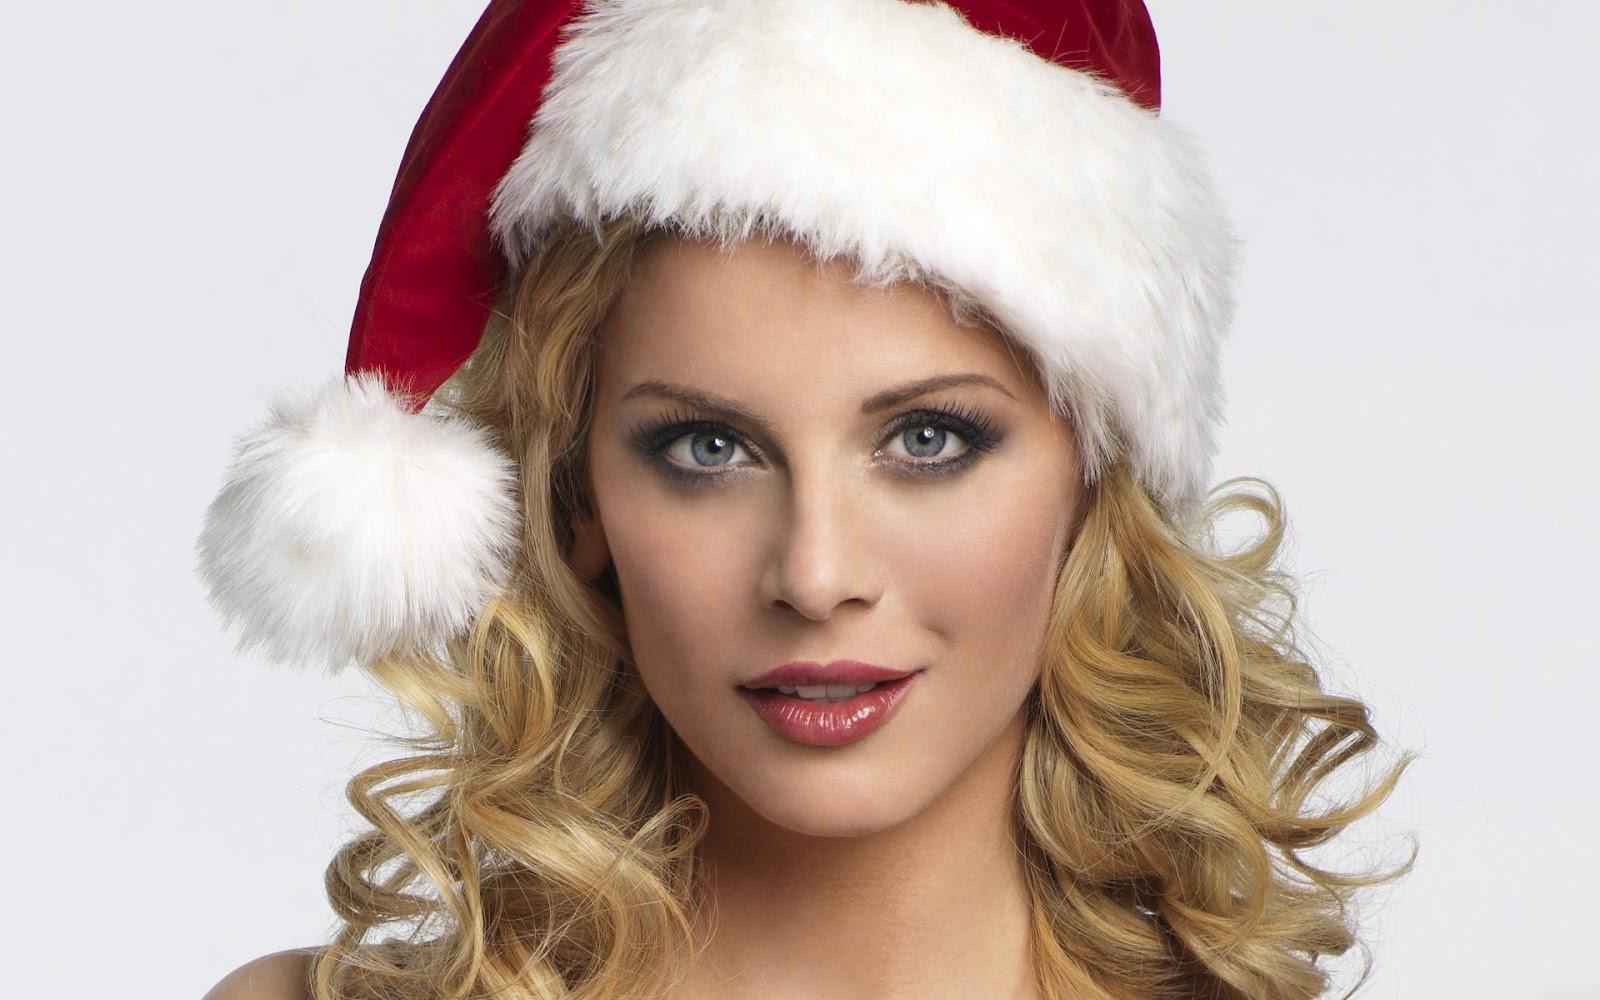 http://1.bp.blogspot.com/-LQuk27tJ3iI/UBvtBjEHbPI/AAAAAAAAJuU/pU7-Y2ek0hs/s1600/christmas-a-hat.jpg